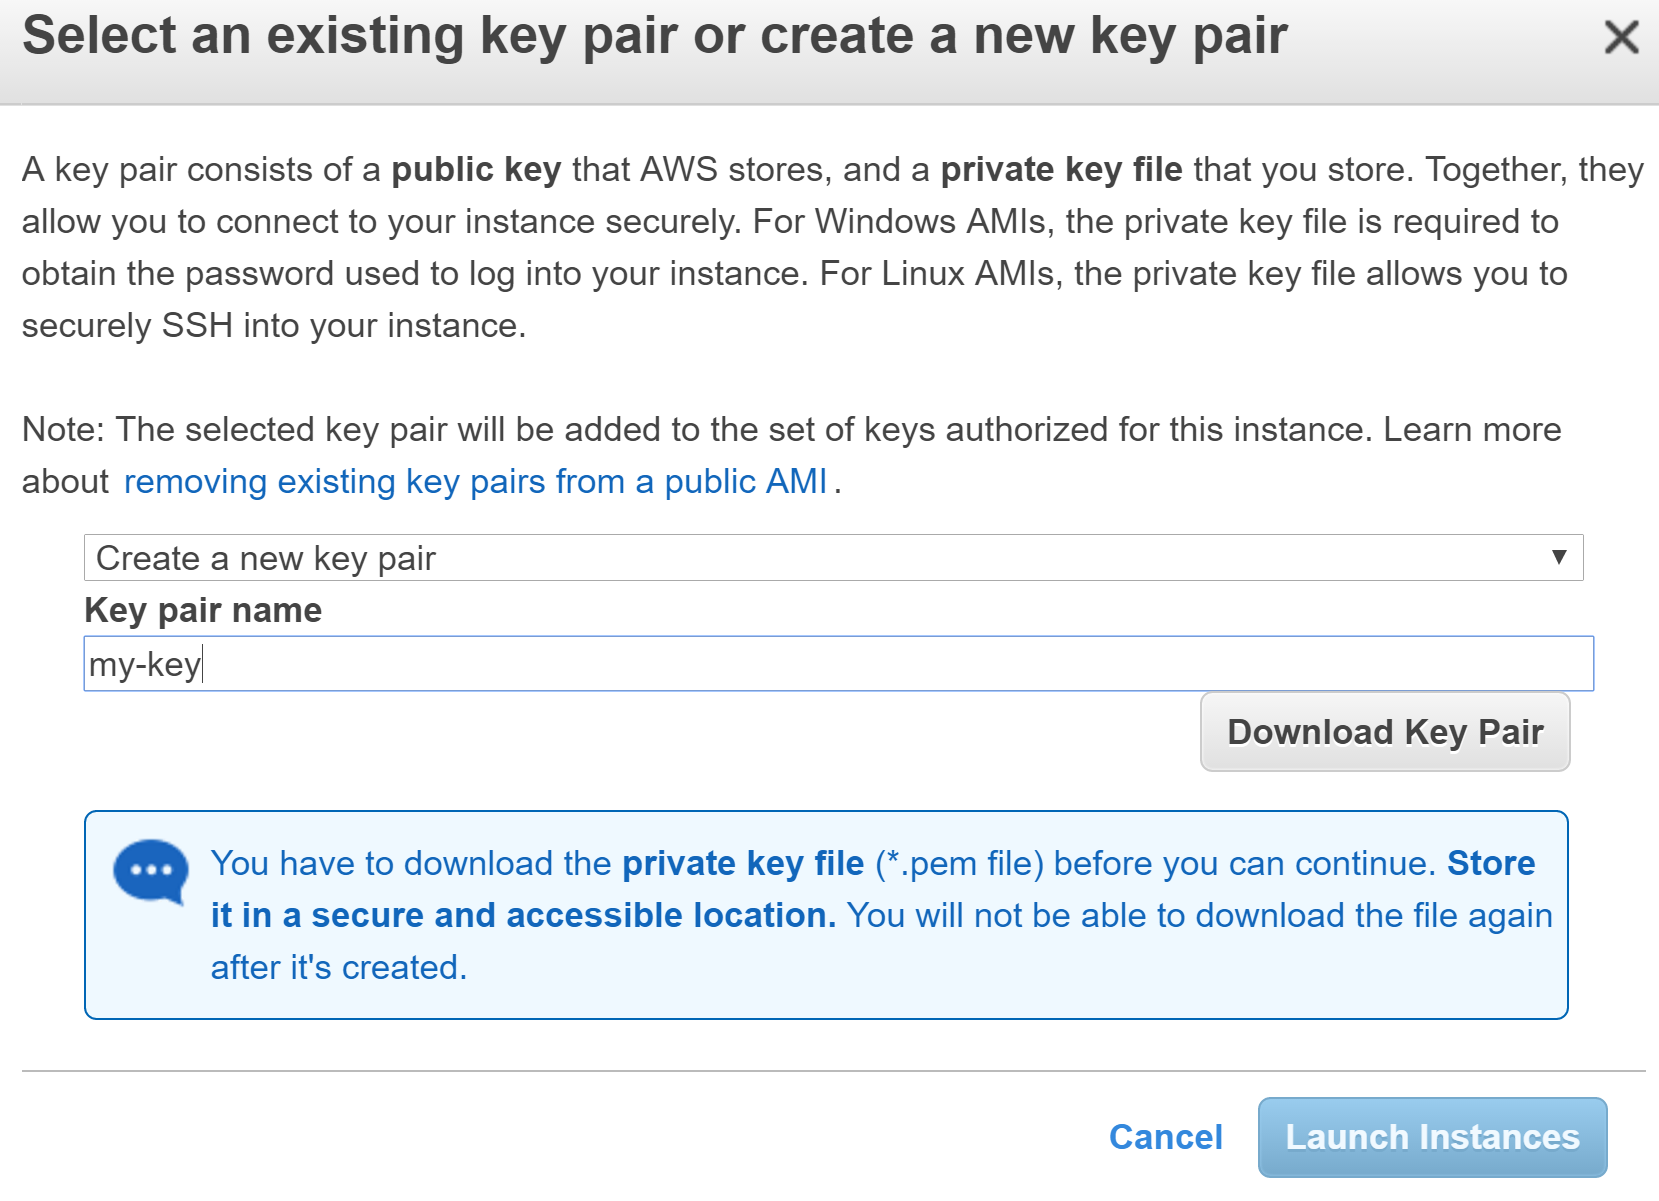 EC2 key